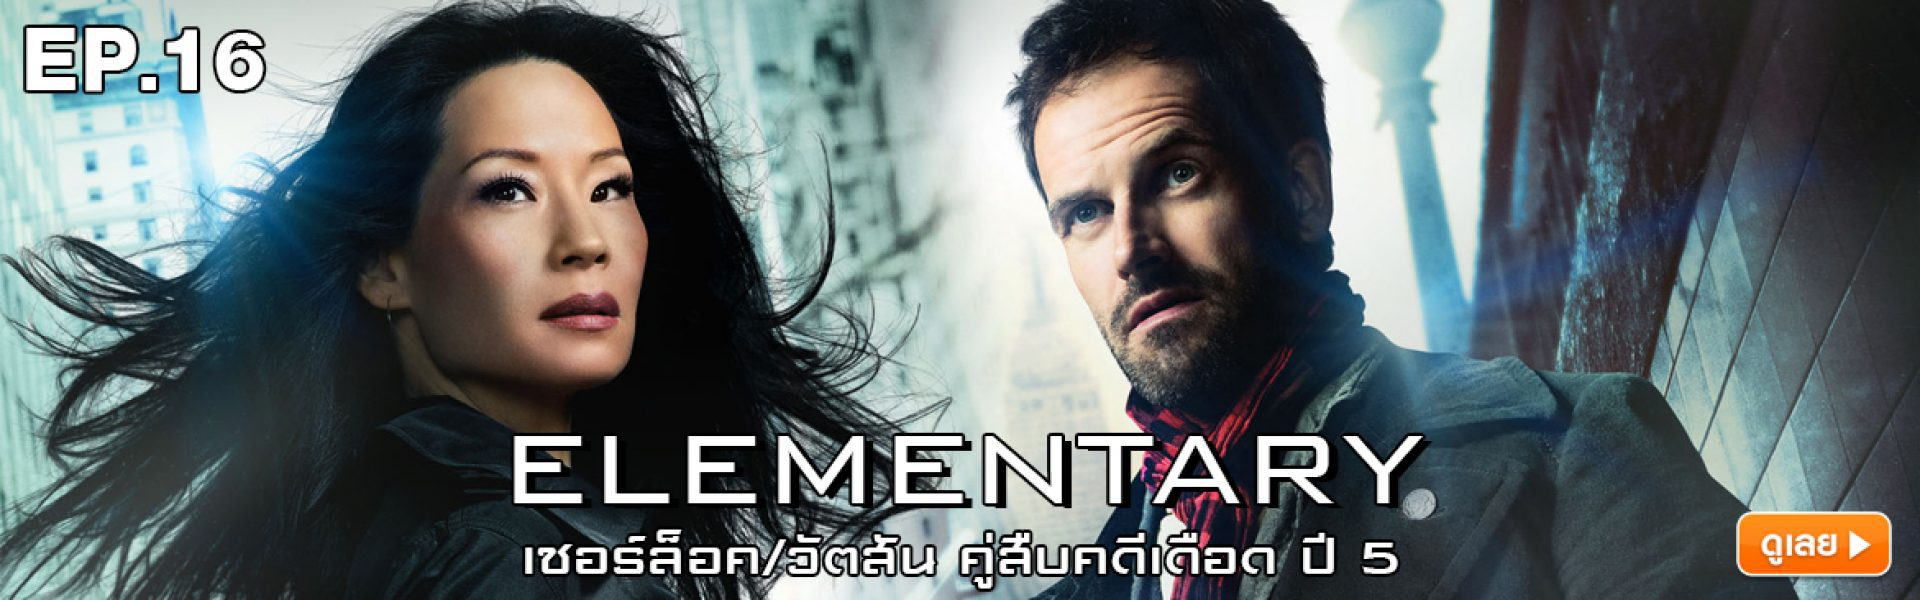 Elementary เชอร์ล็อค/วัตสัน คู่สืบคดีเดือด ปี 5 EP.16